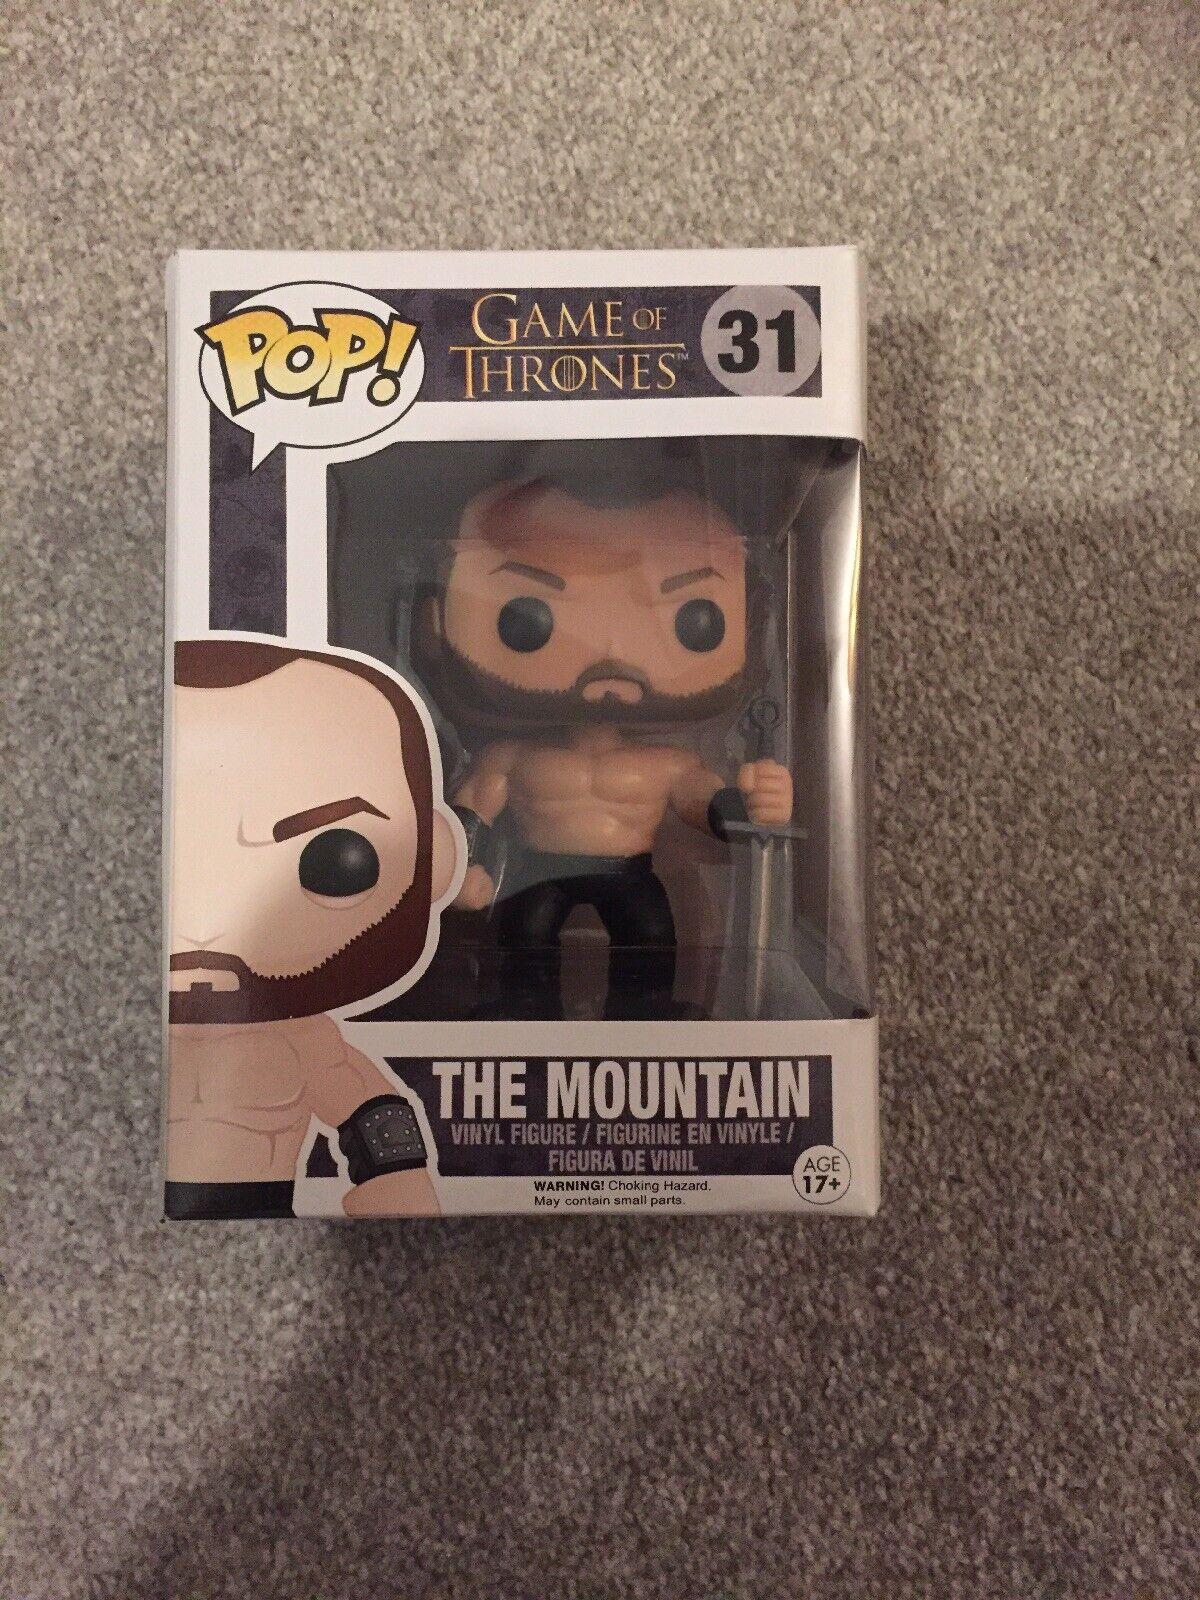 Game Of Thrones Funko Pop  Figure no. 31 The Mountain